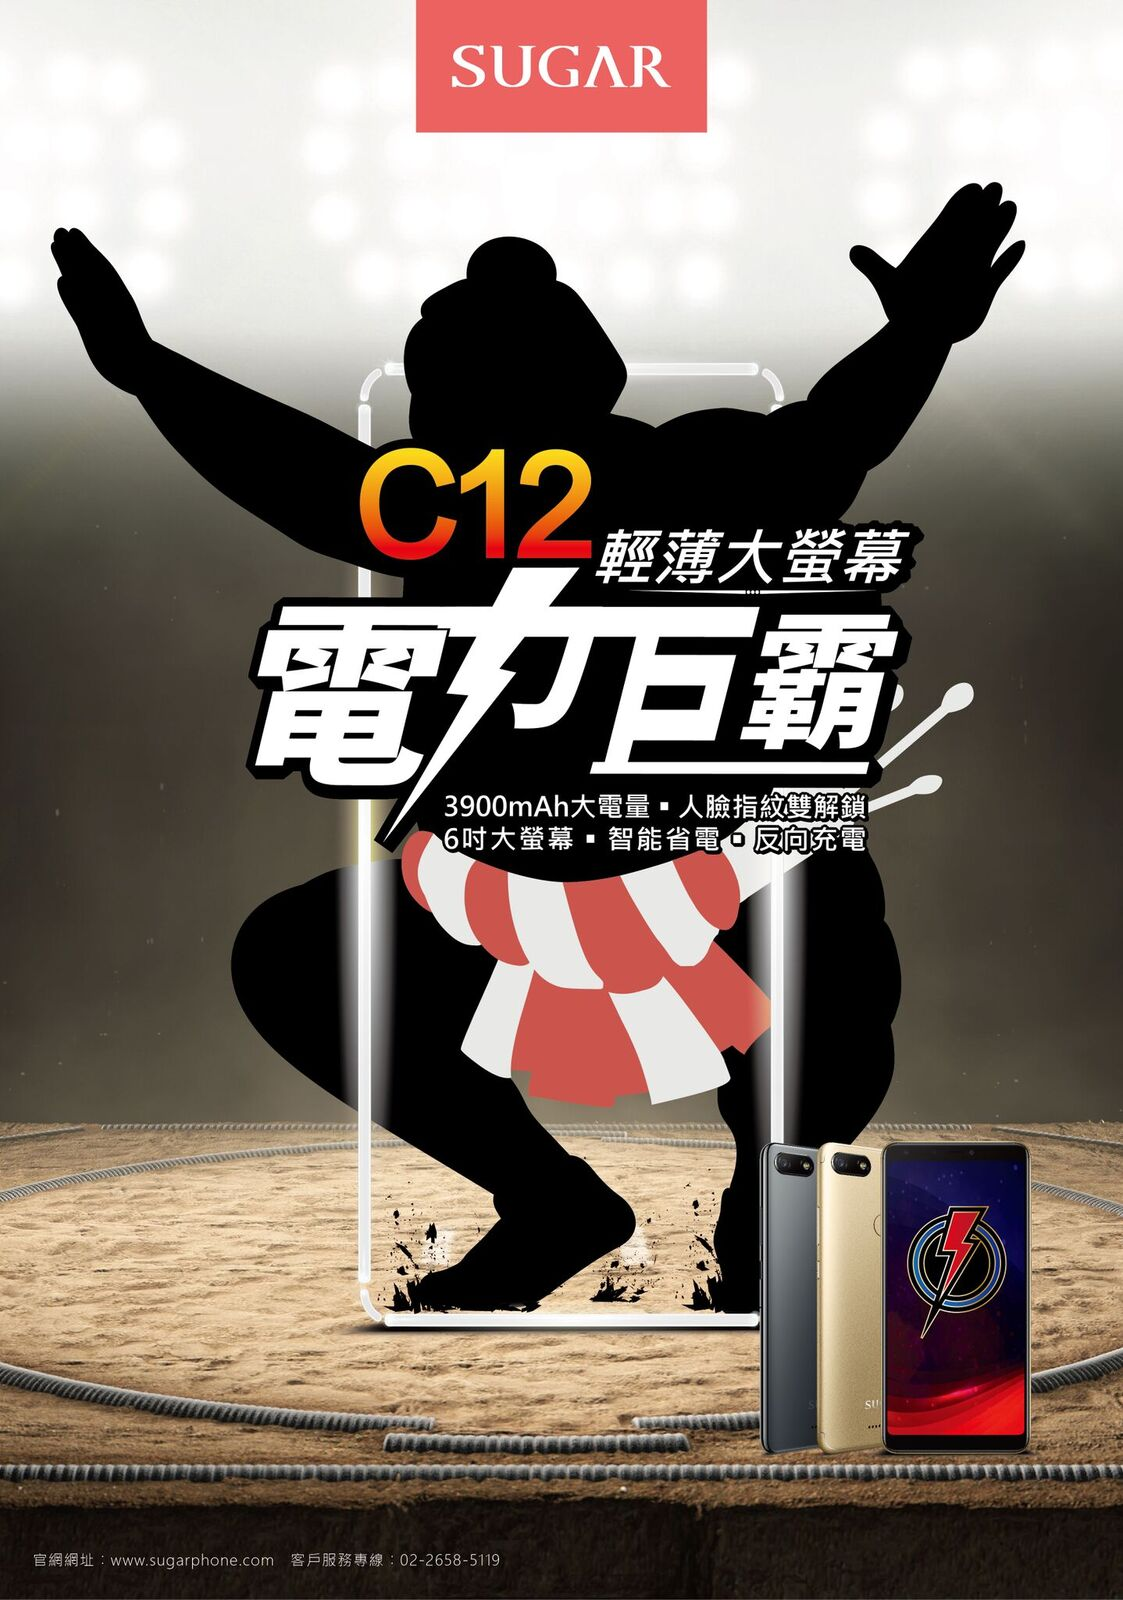 SUGAR C12新夏FUN電  好禮大FUN送 SUGAR送你去看「Bii畢書盡演唱會」